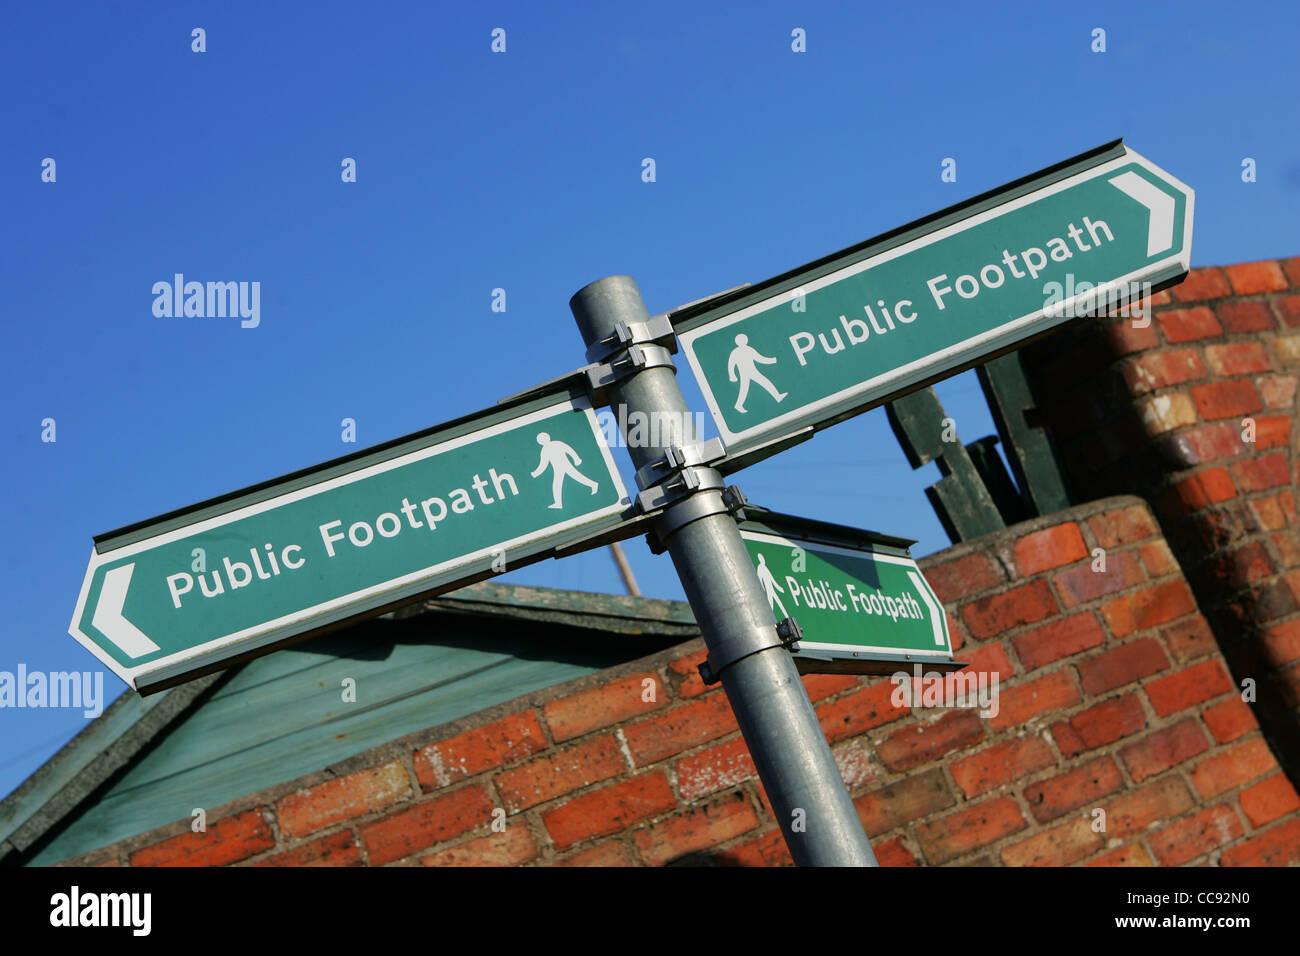 public footpath sign, direction, uk - Stock Image